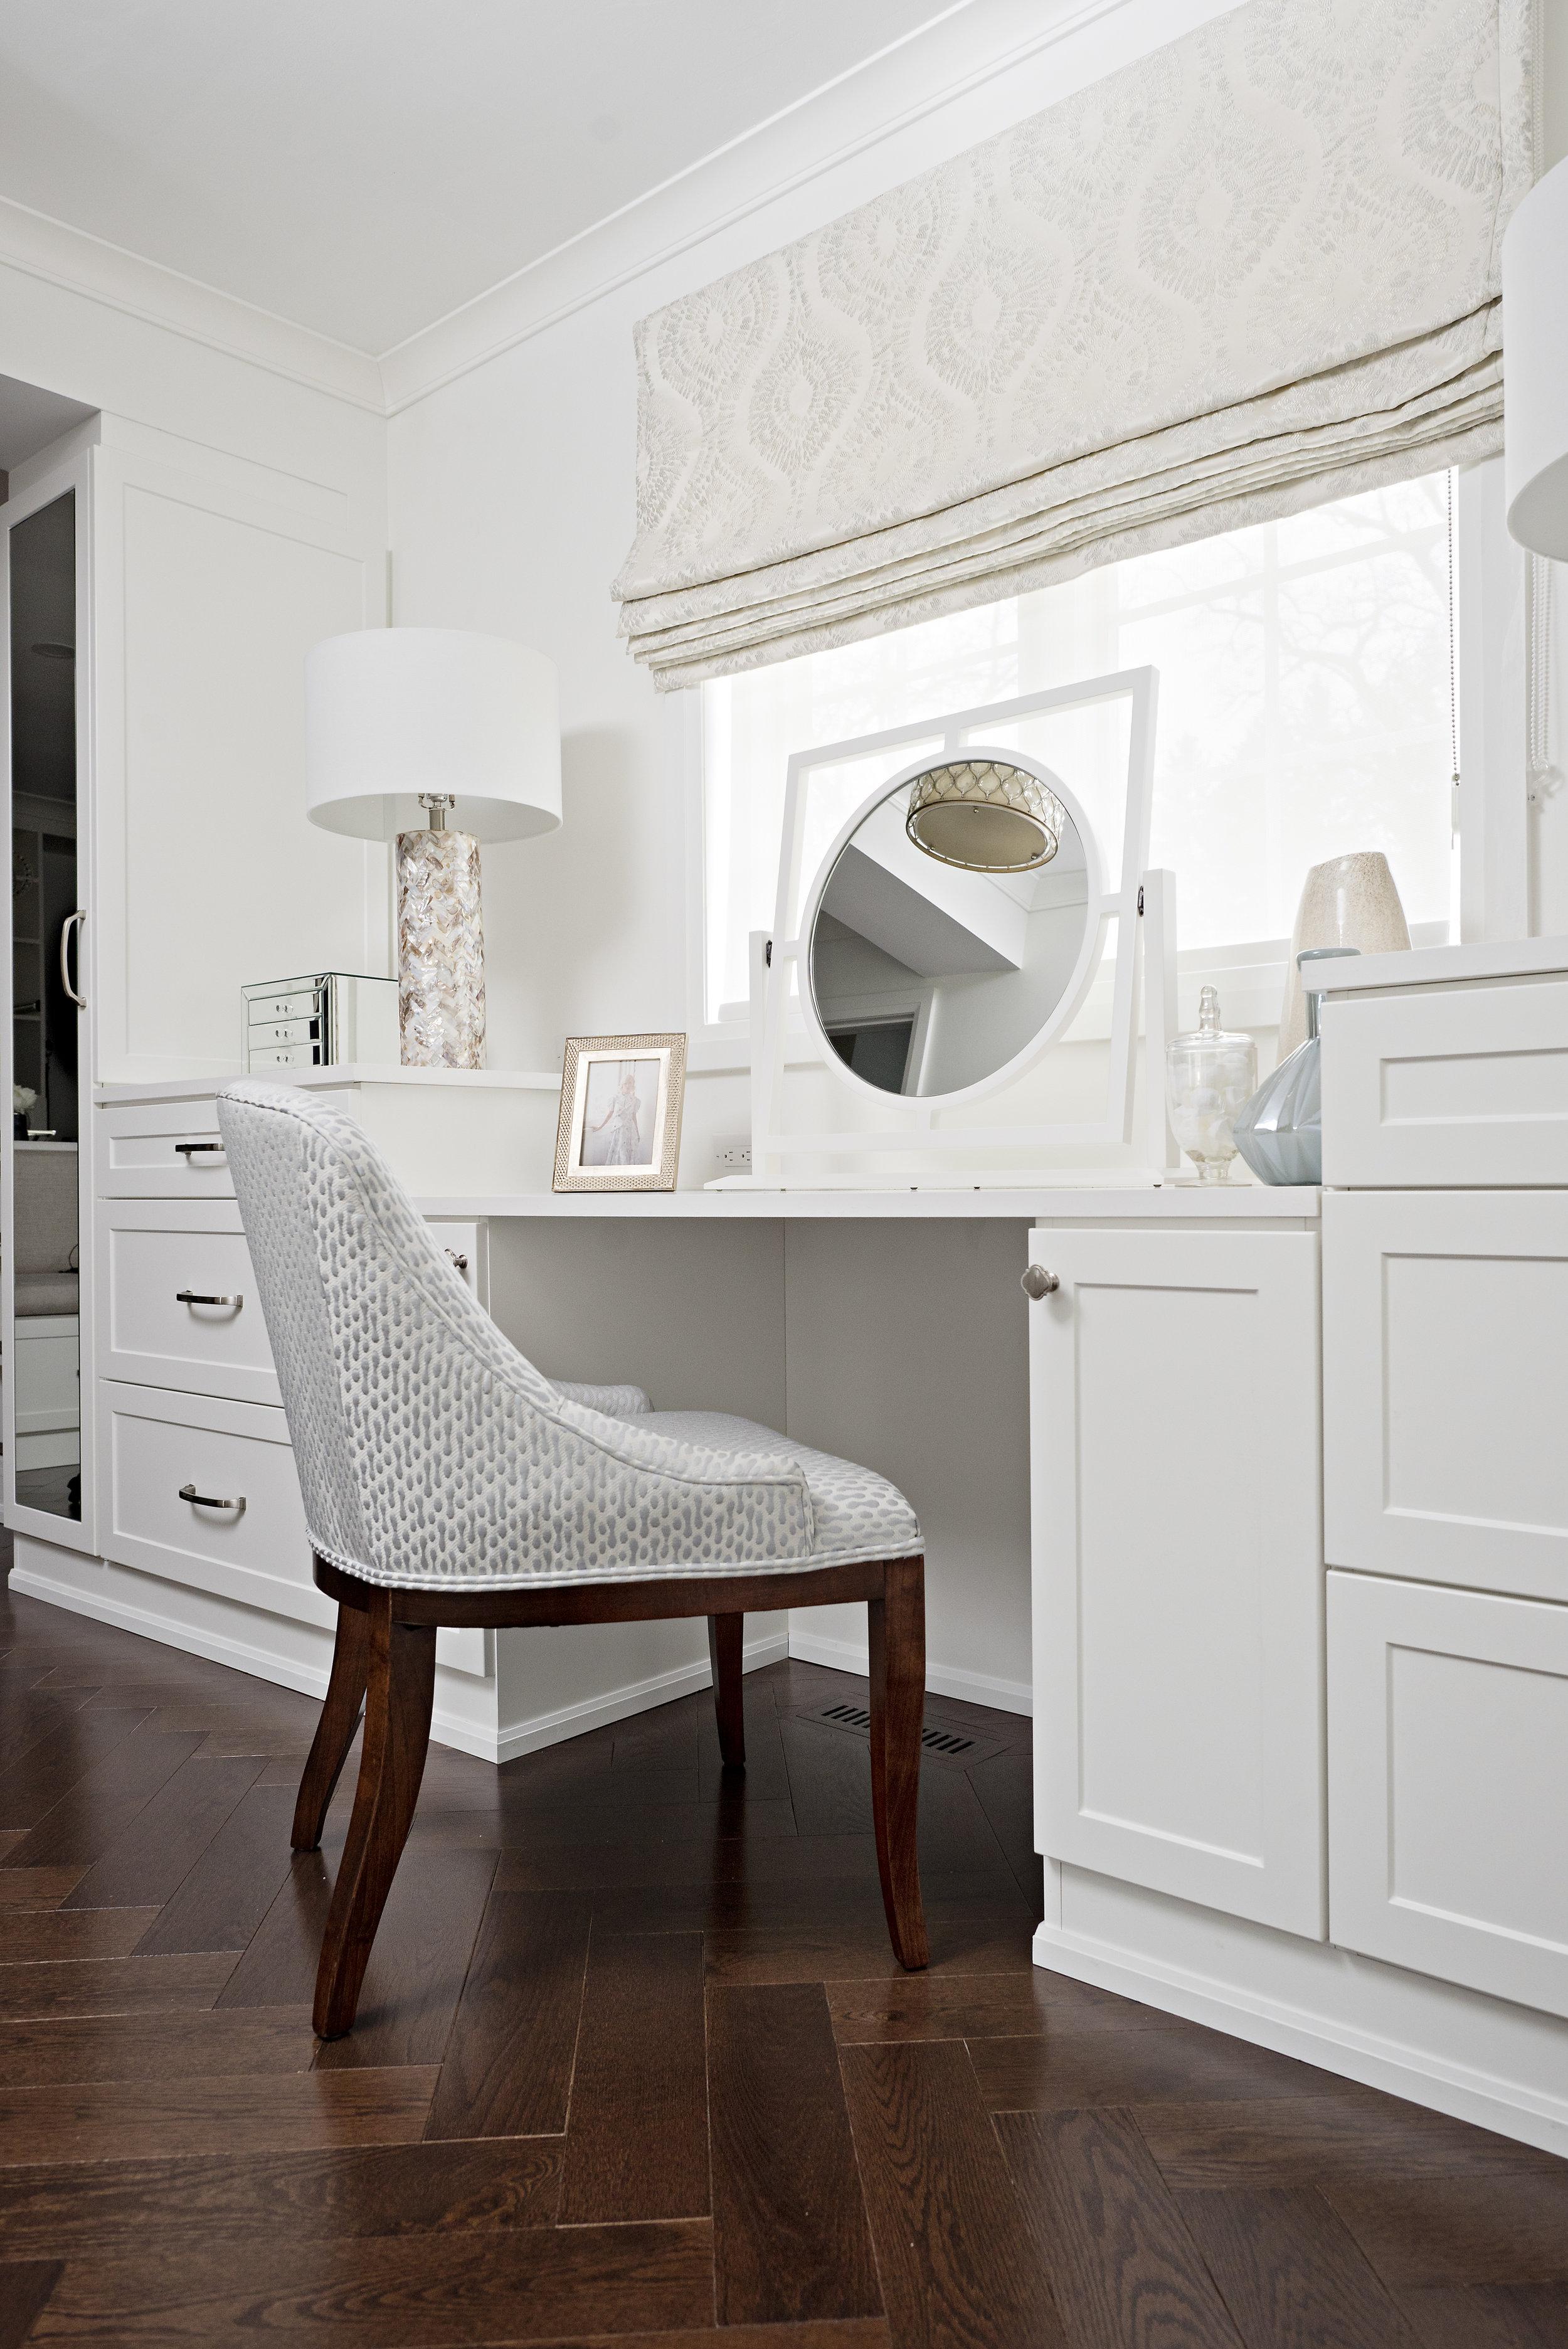 pizzale design interior design make up vanity reupholstery dark herringbone install flooring unique mirror tone on tone pattern roman fabric shade wall panelling white walk in closet.jpg